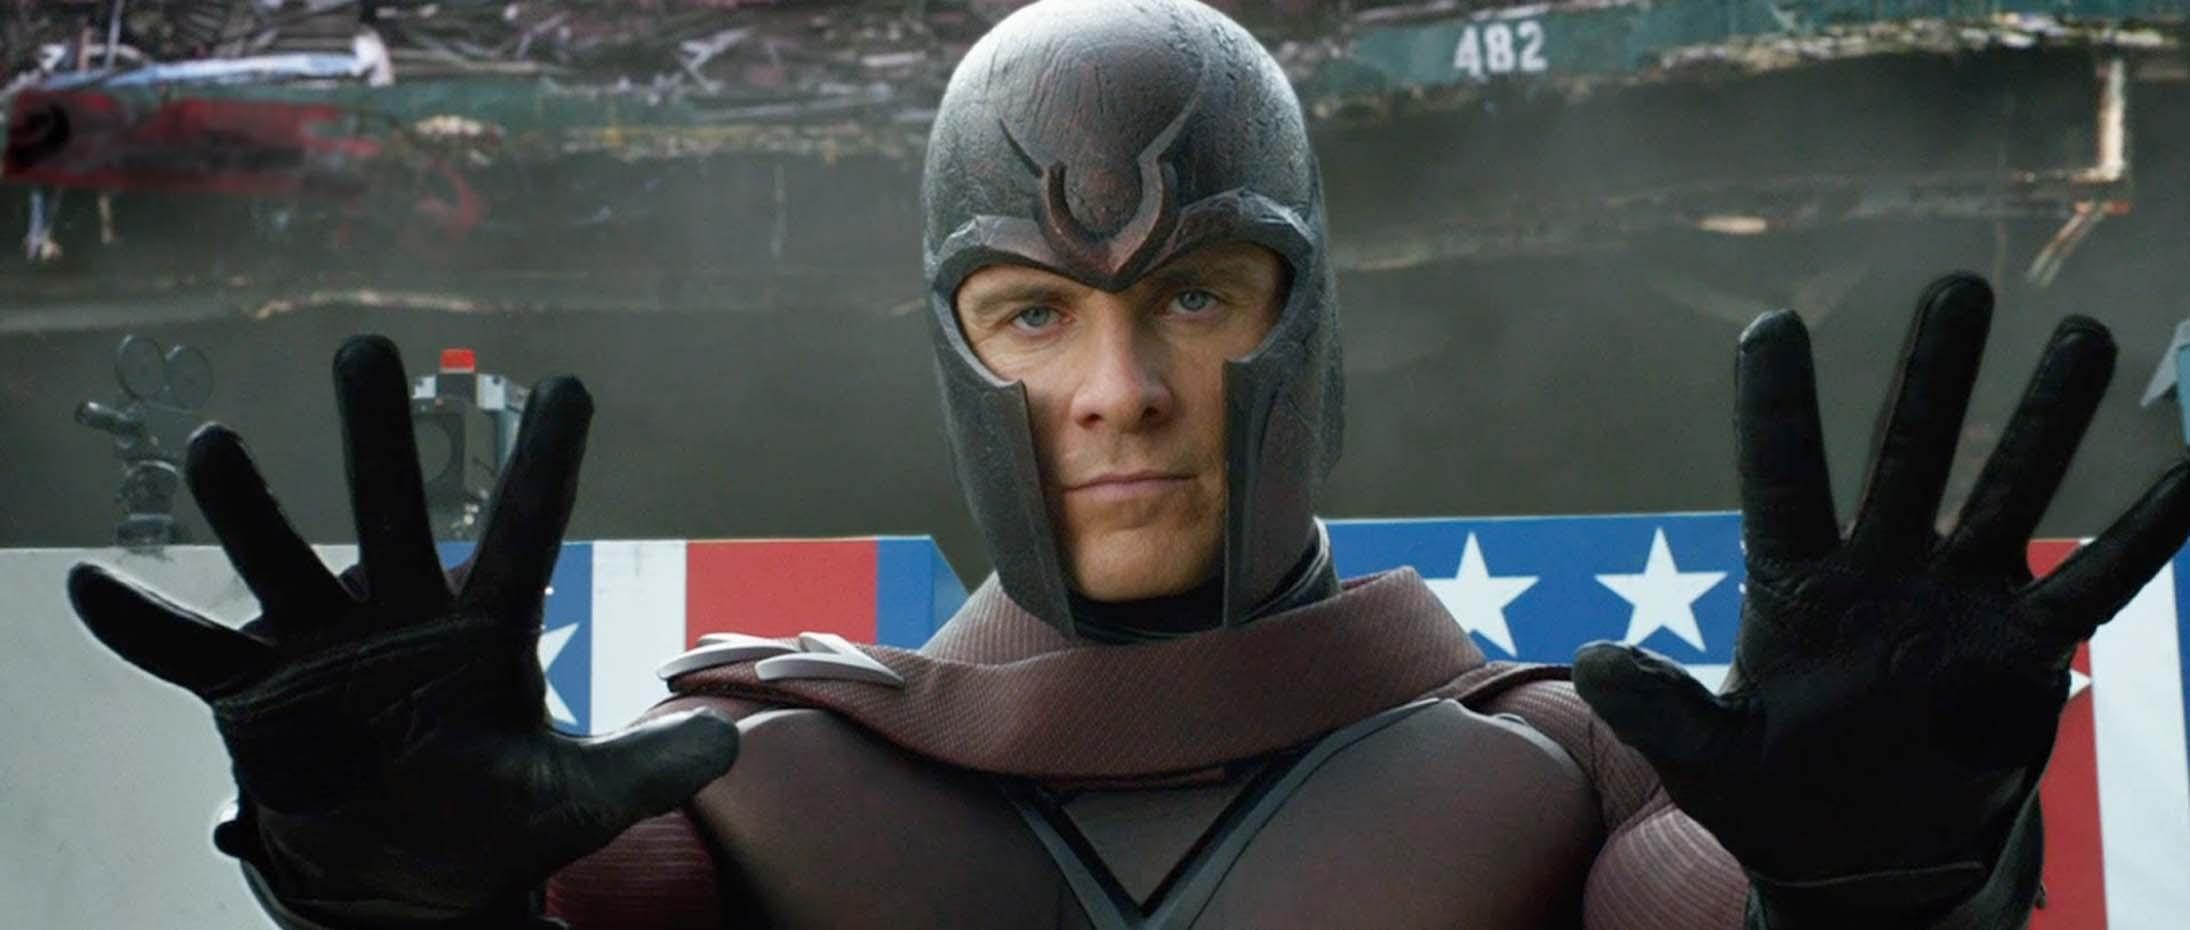 Magneto Micheal Fassbender 2